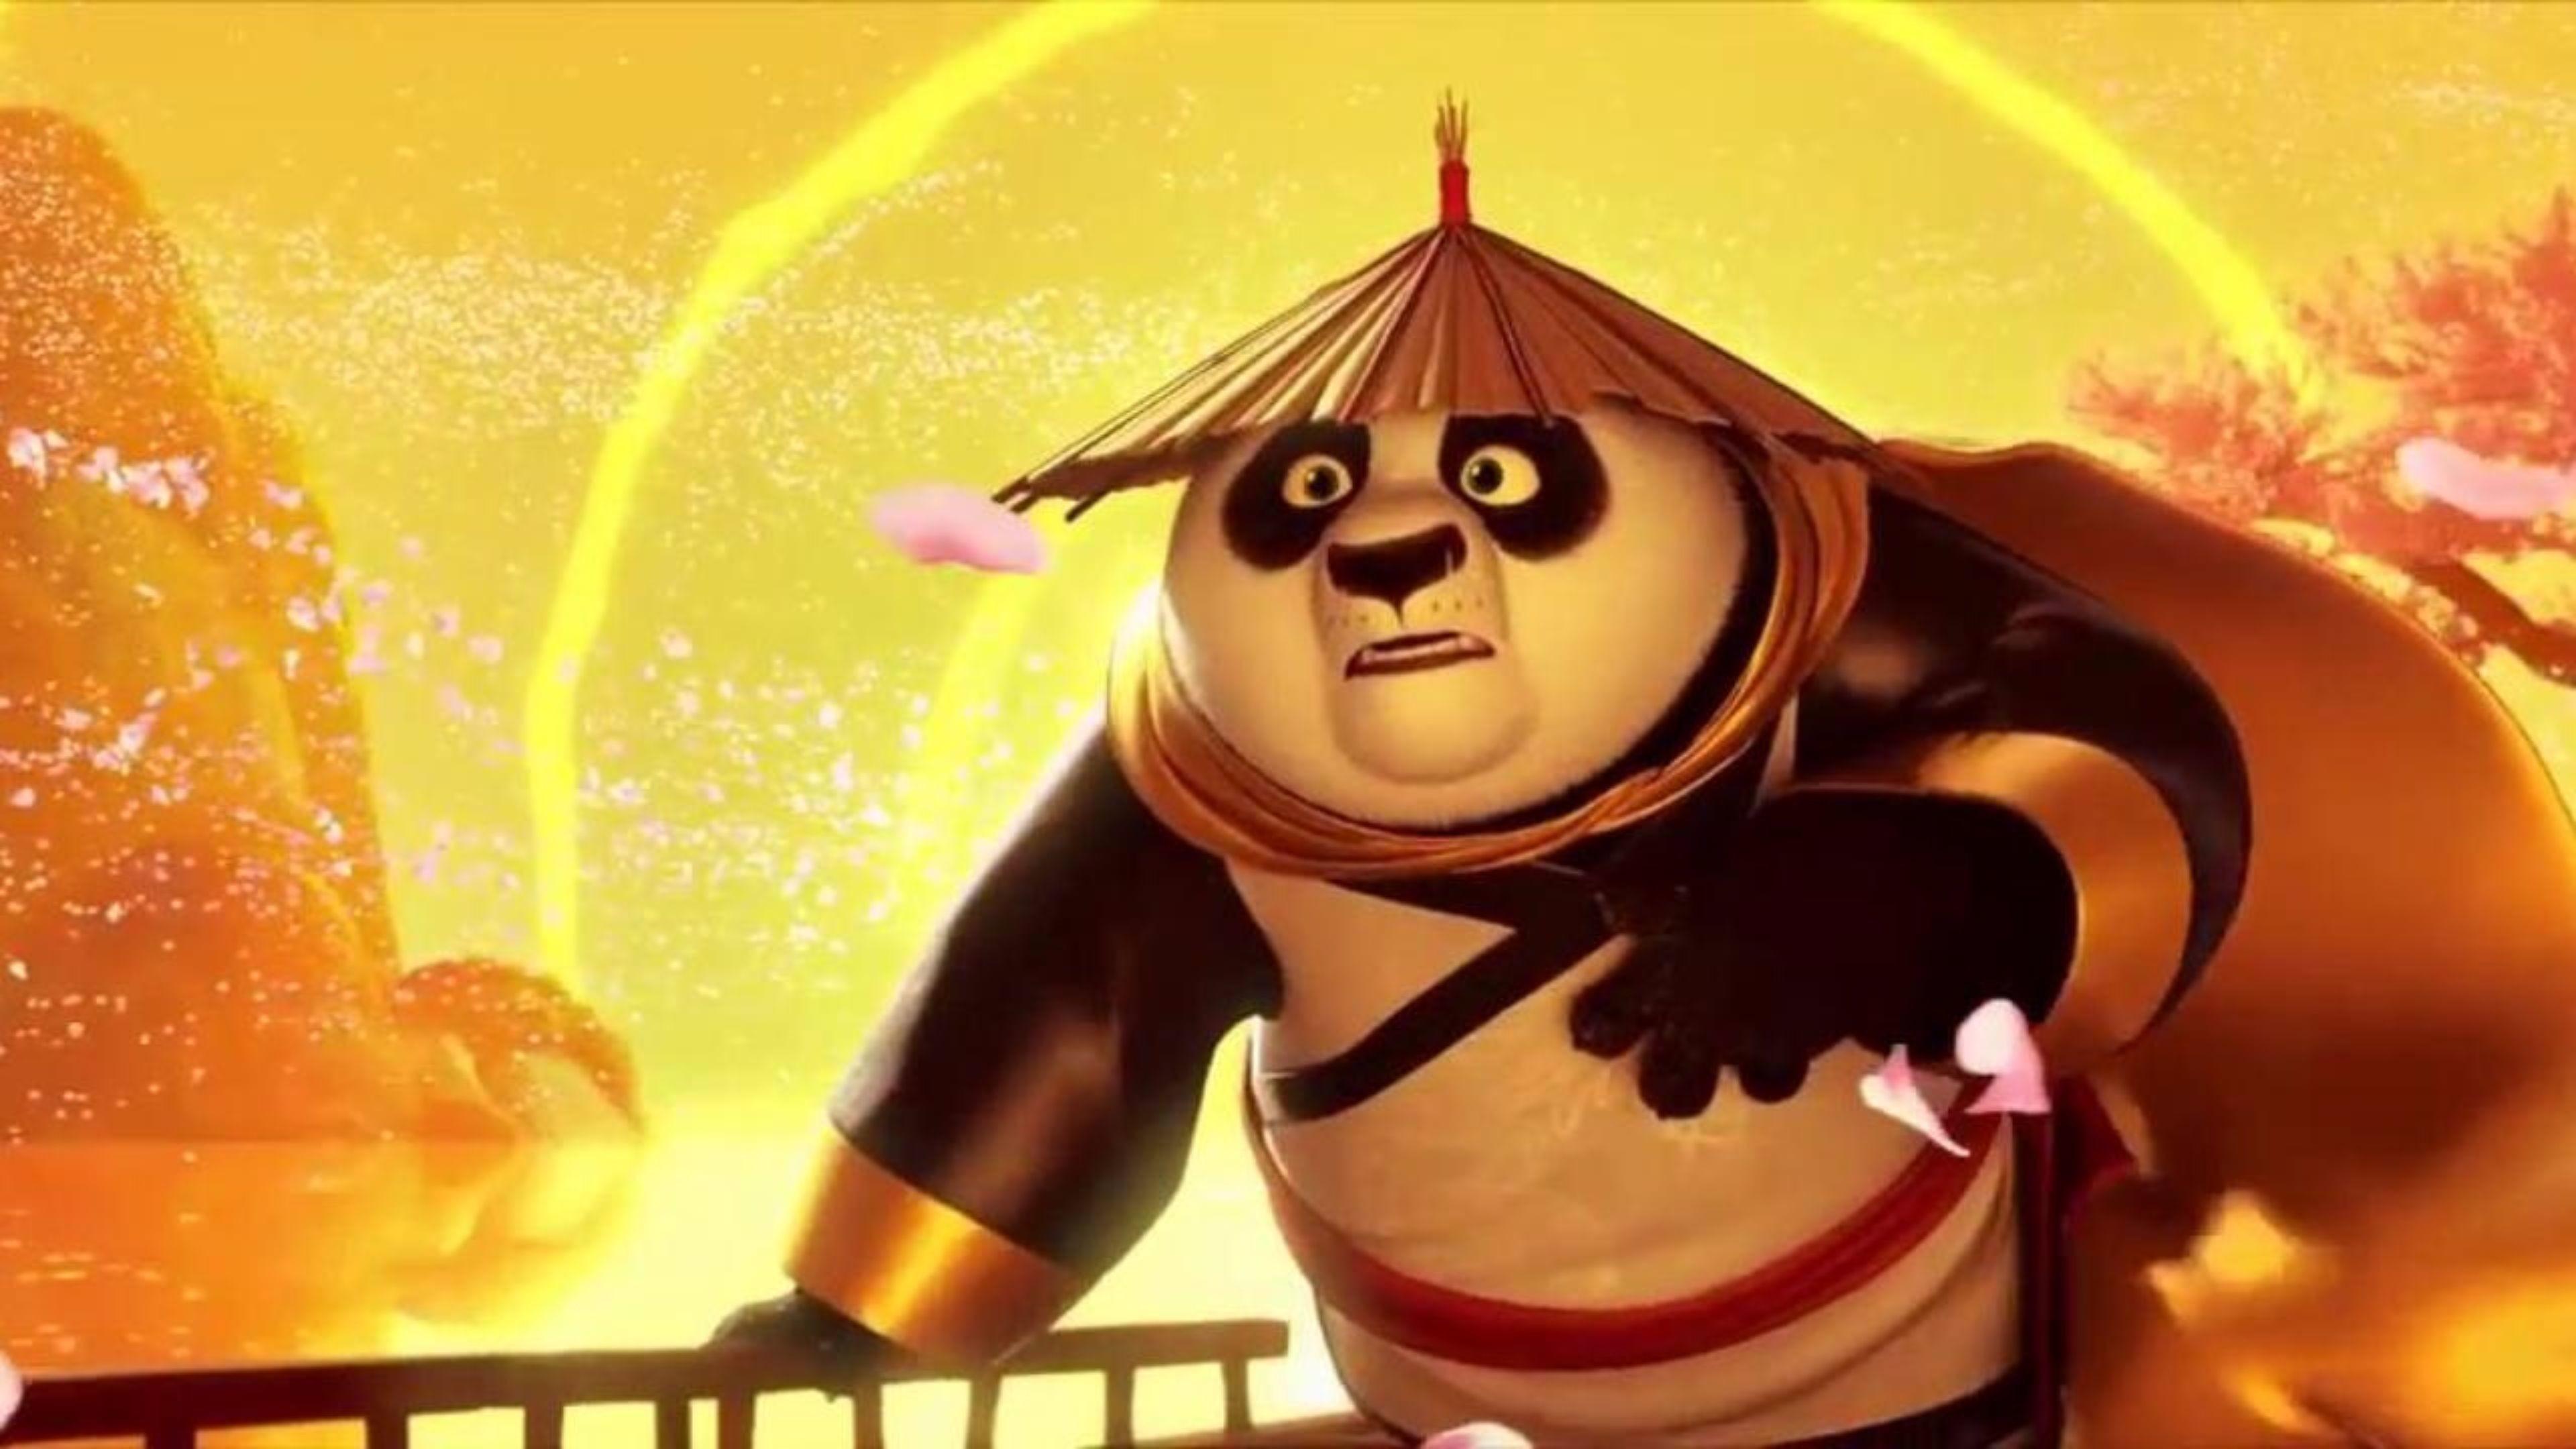 Launch Trailer Kung Fu Panda 3 Movie 4K Wallpaper   Free 4K Wallpaper